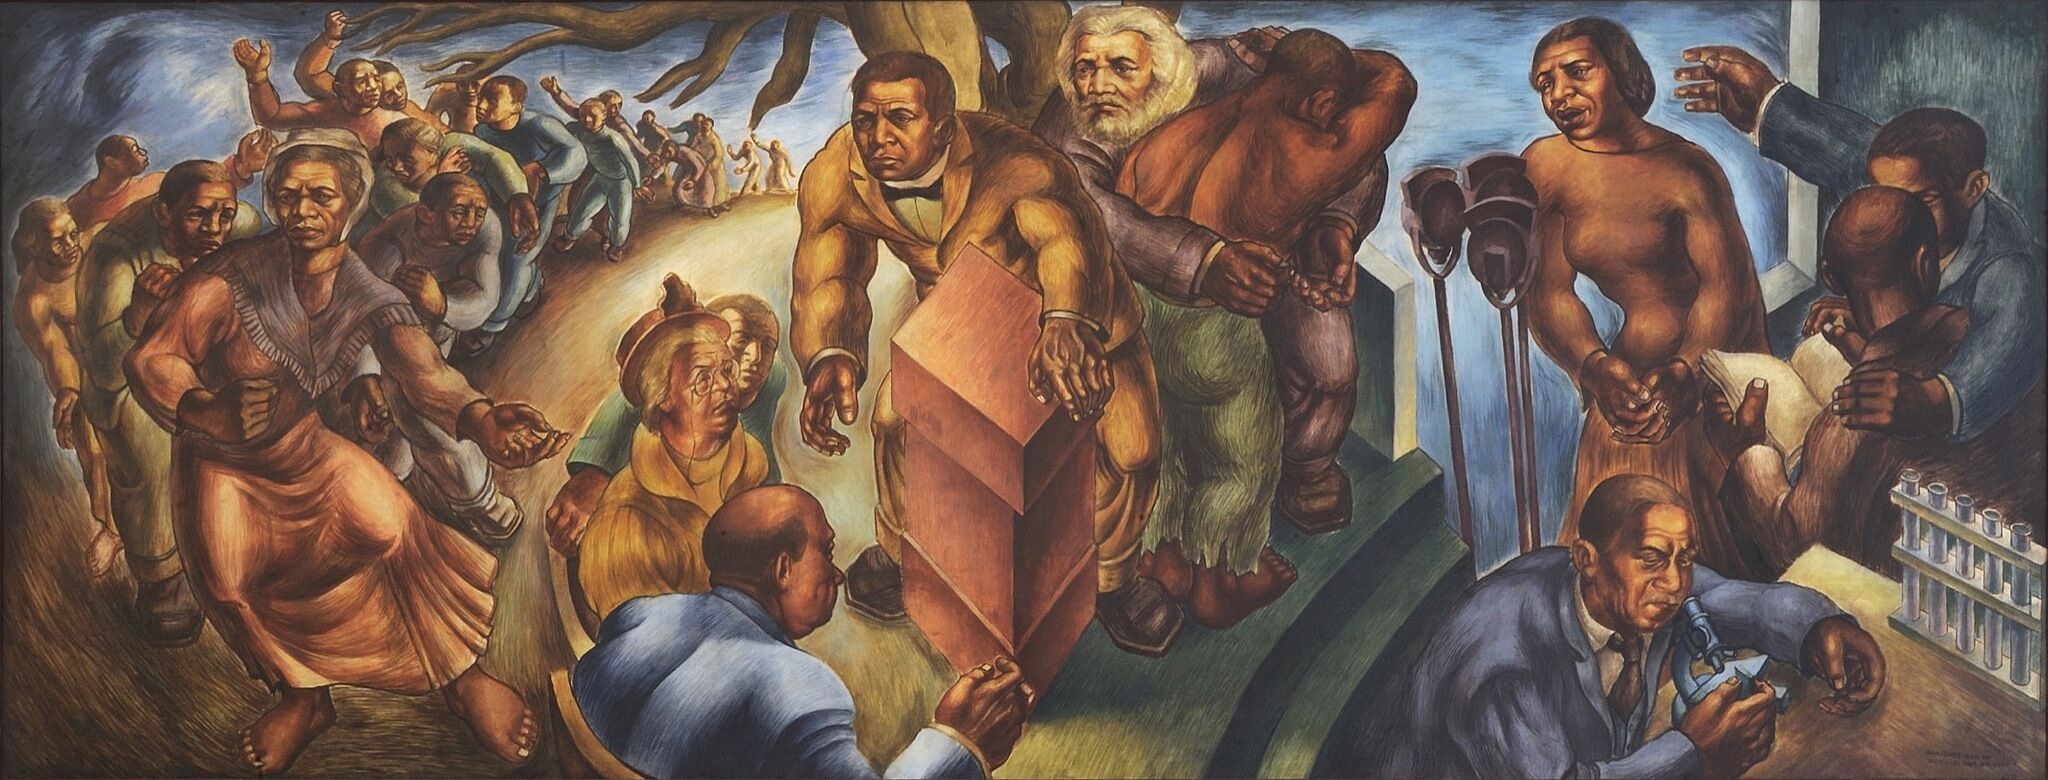 A mural depicting various black American historical figures.